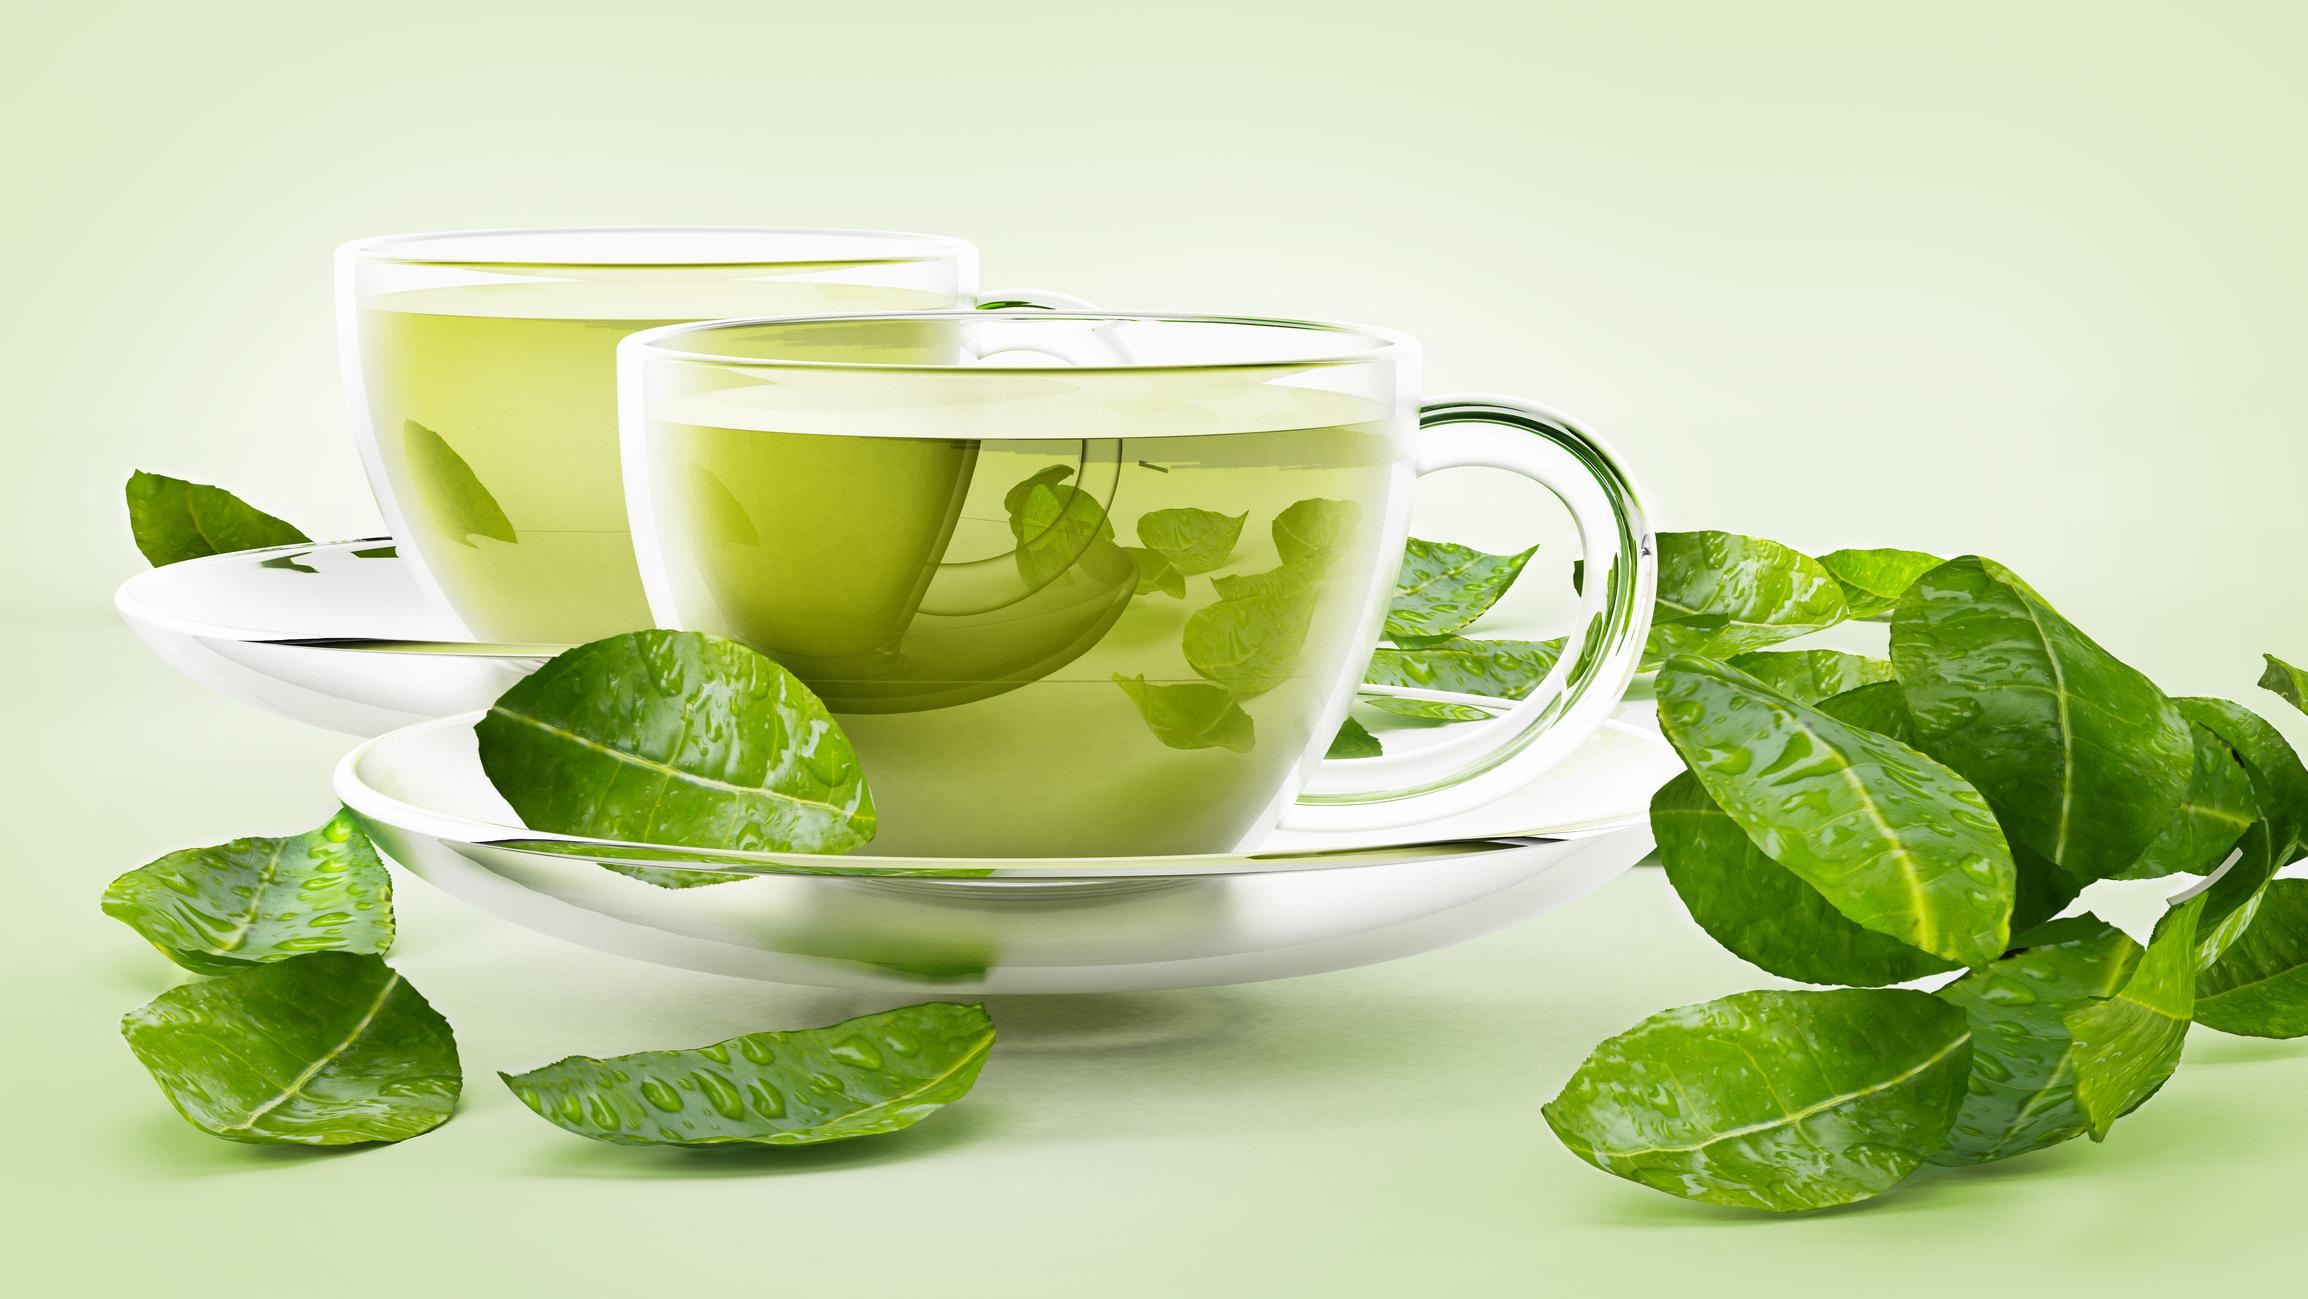 Image result for green tea images